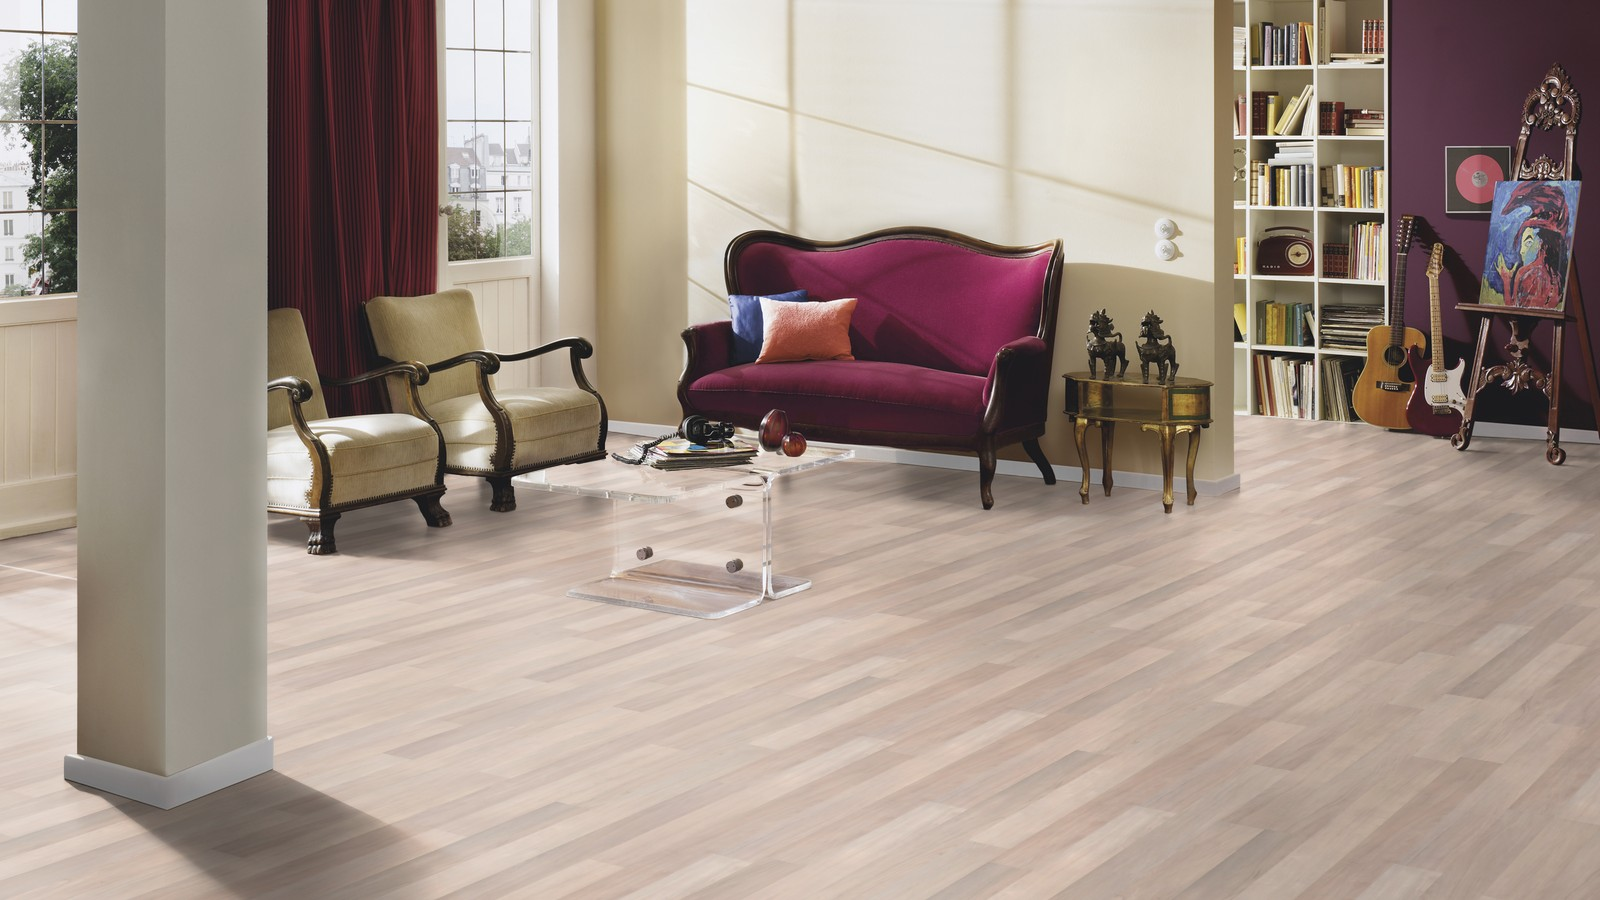 Avatara Yew Grey Beige Man Made Wood Floor Wood4floors